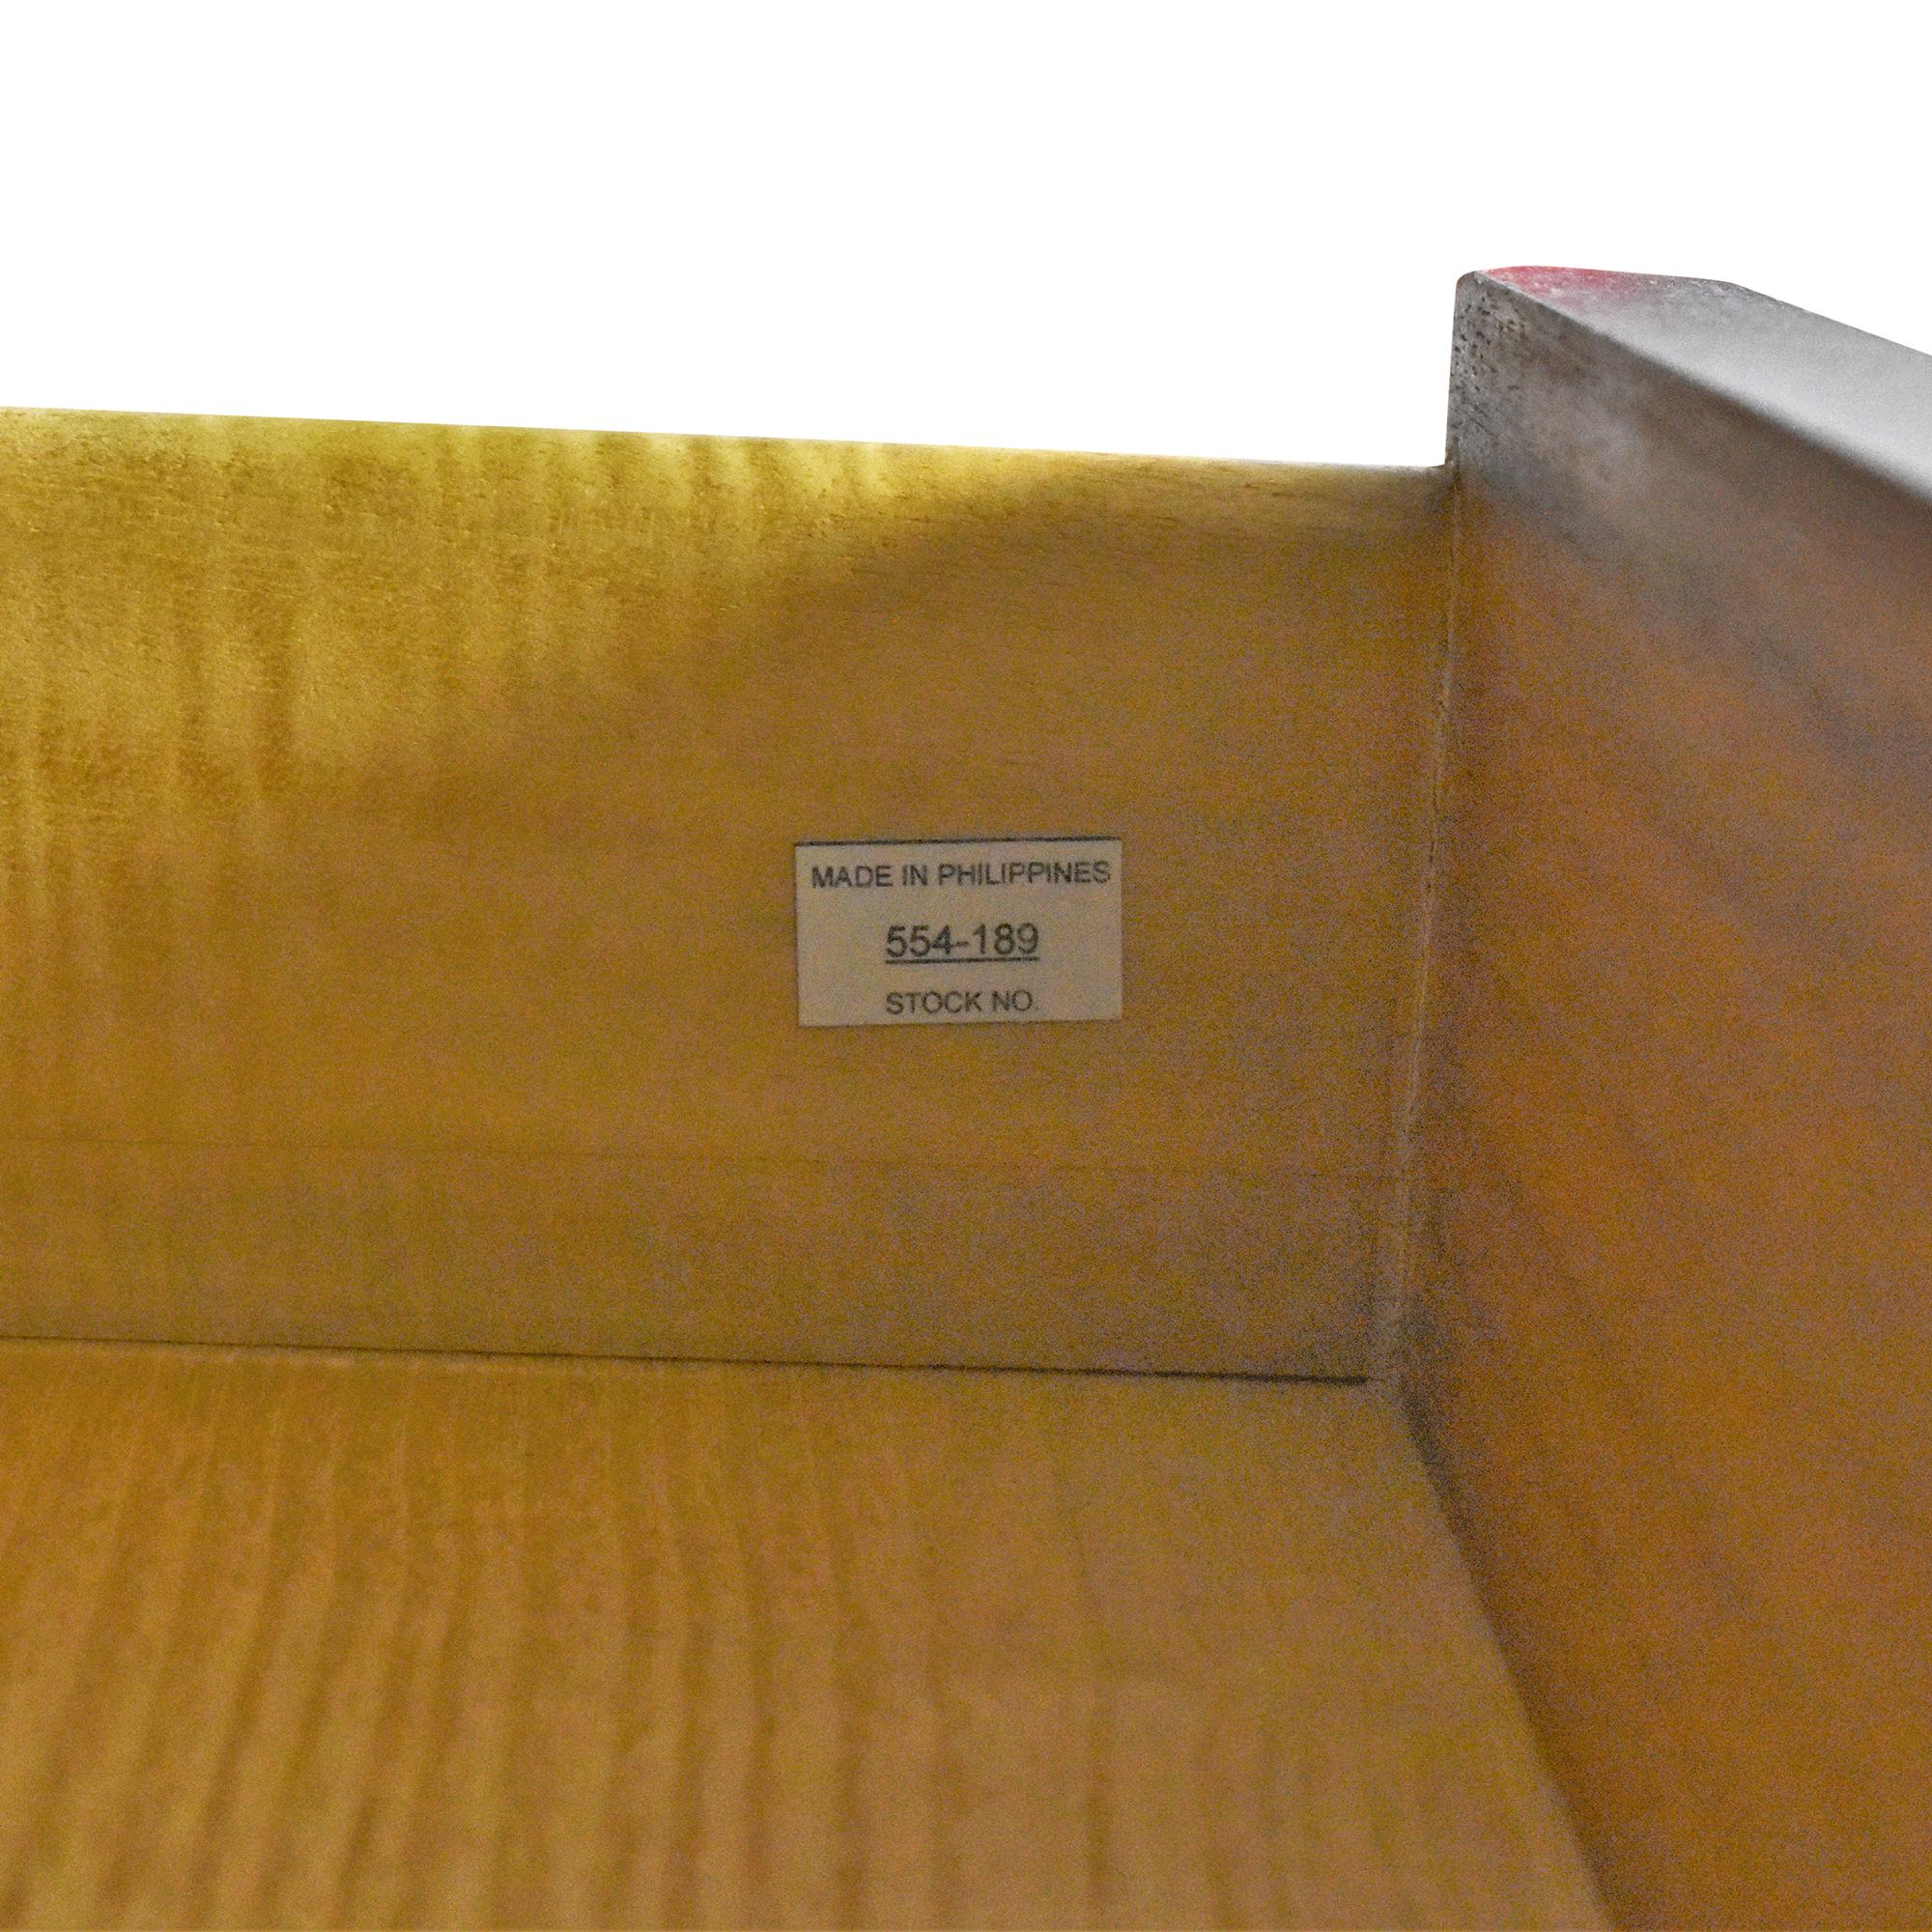 Crate & Barrel Crate & Barrel Maxine Bar Cabinet on sale